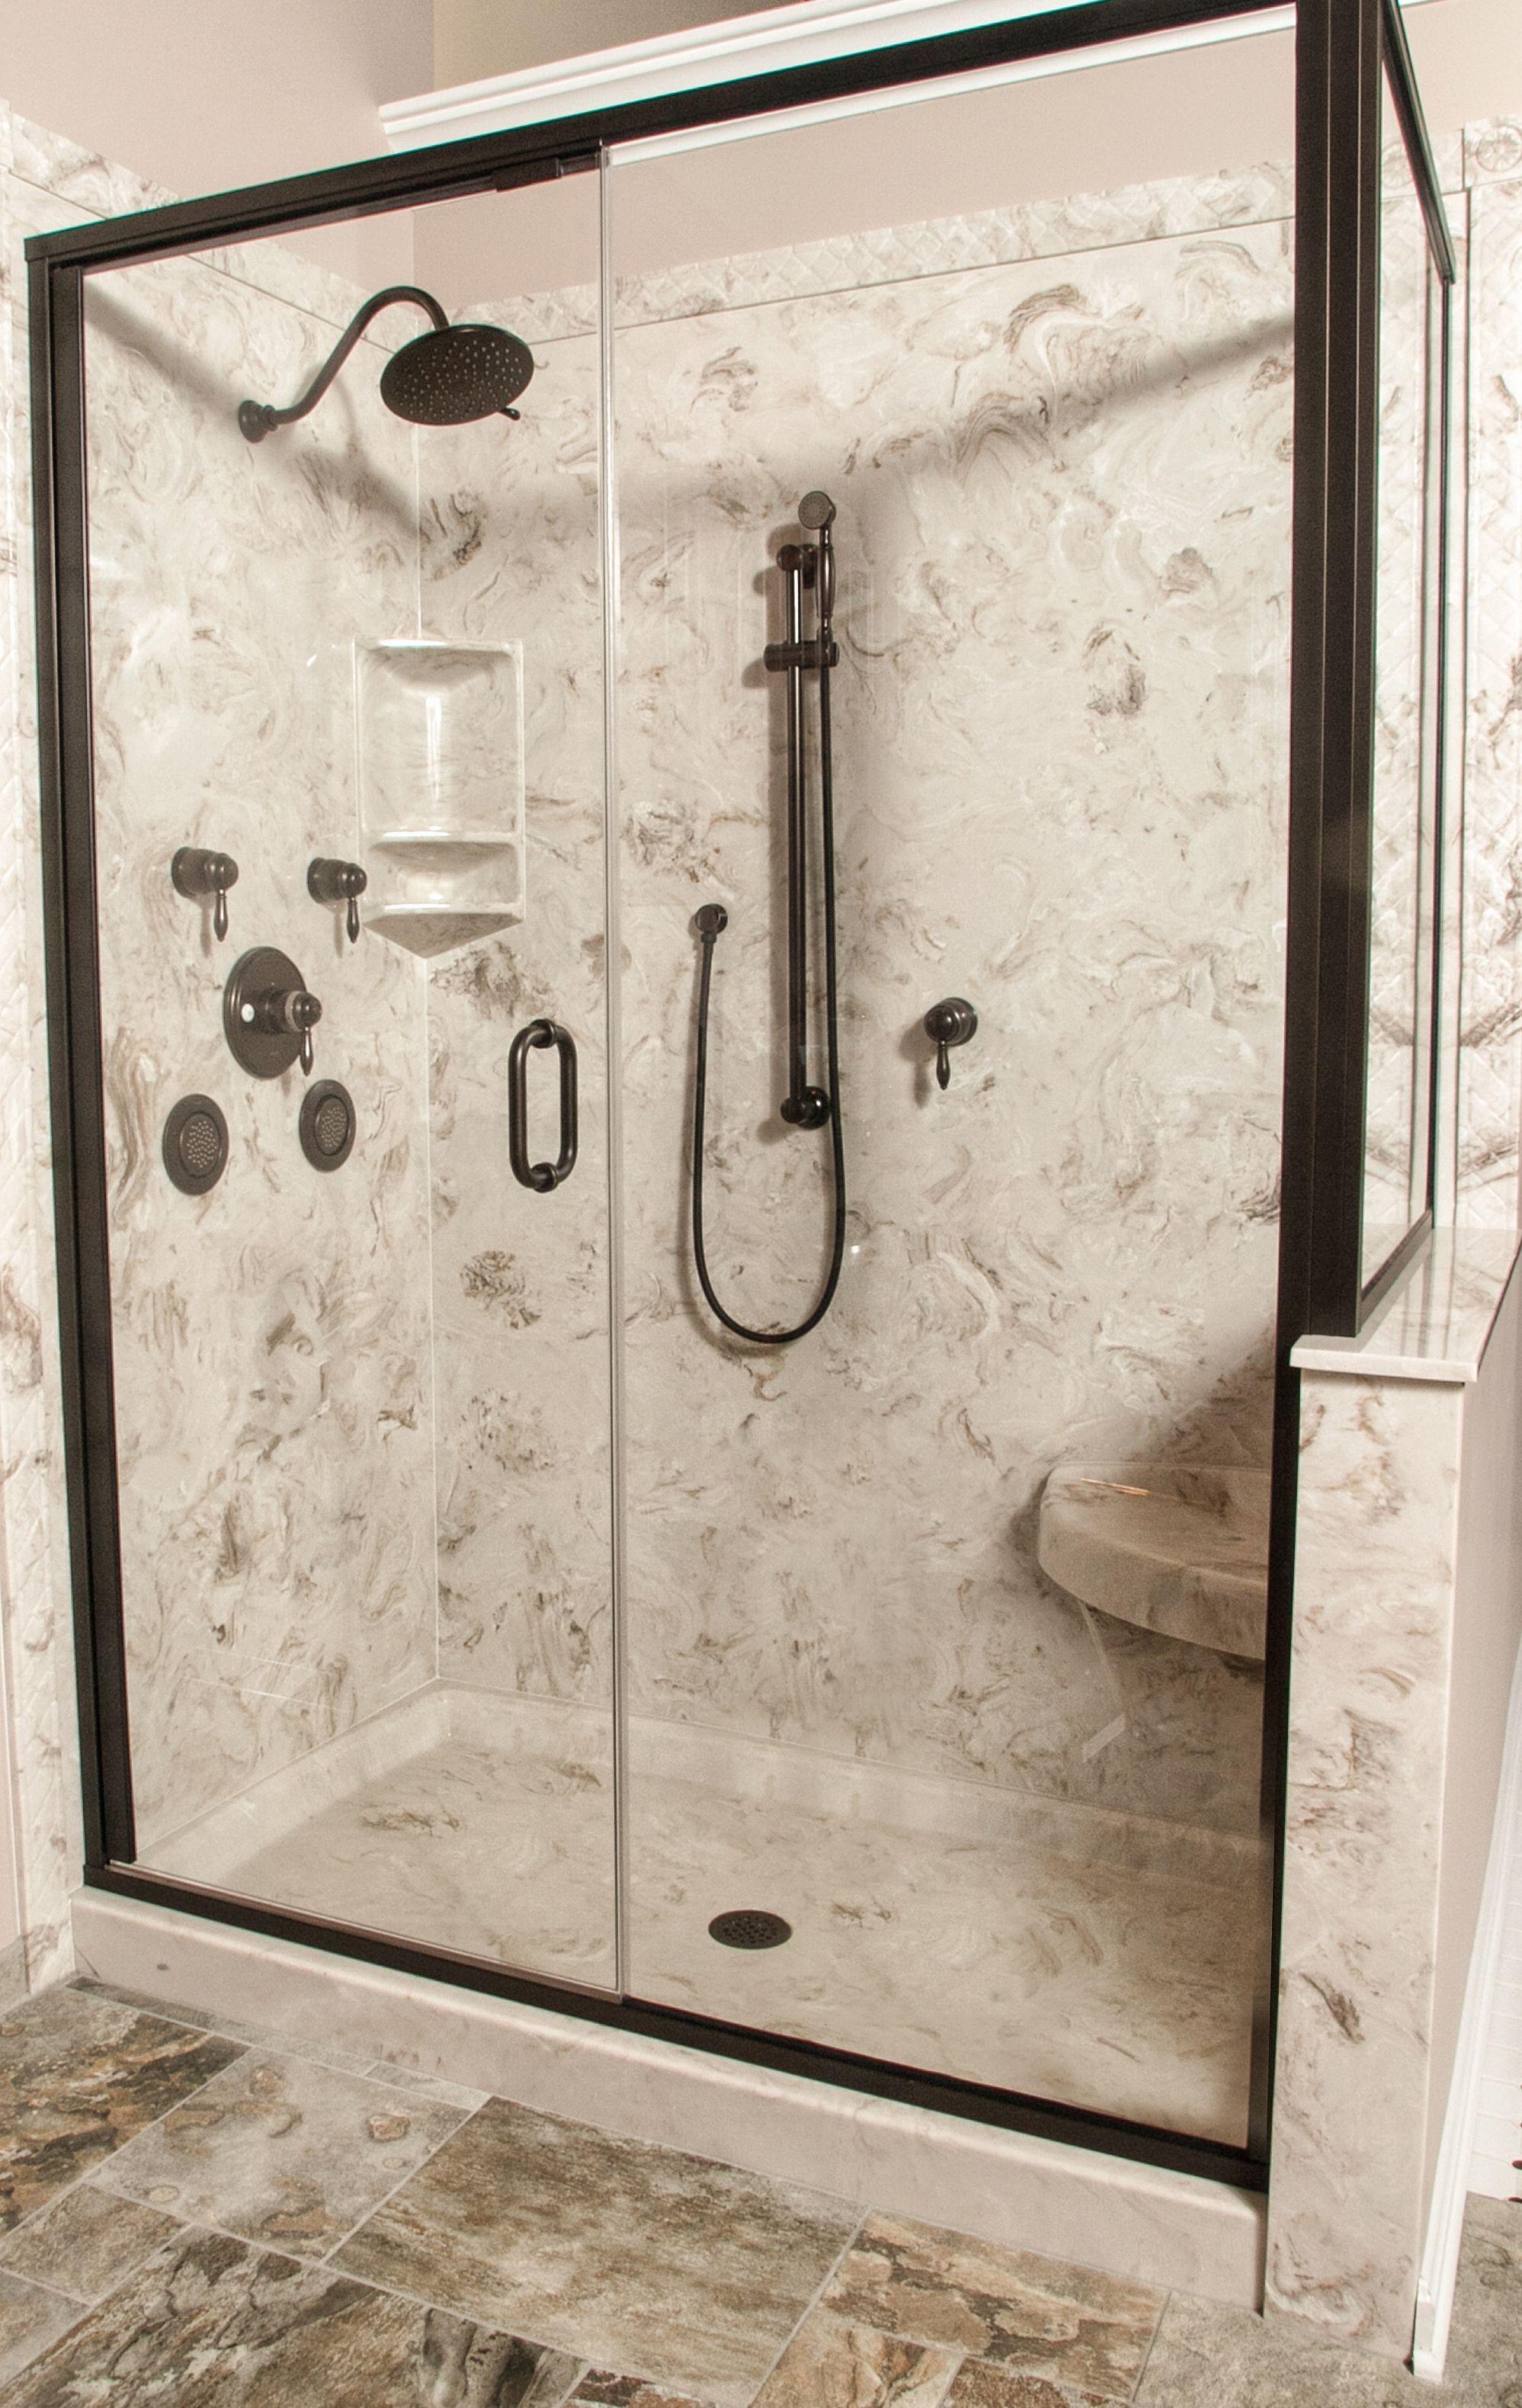 Cultured Marble Shower With Corner Seat Decorative Edge Trim 3 Tiered Bathroom CaddyBathroom